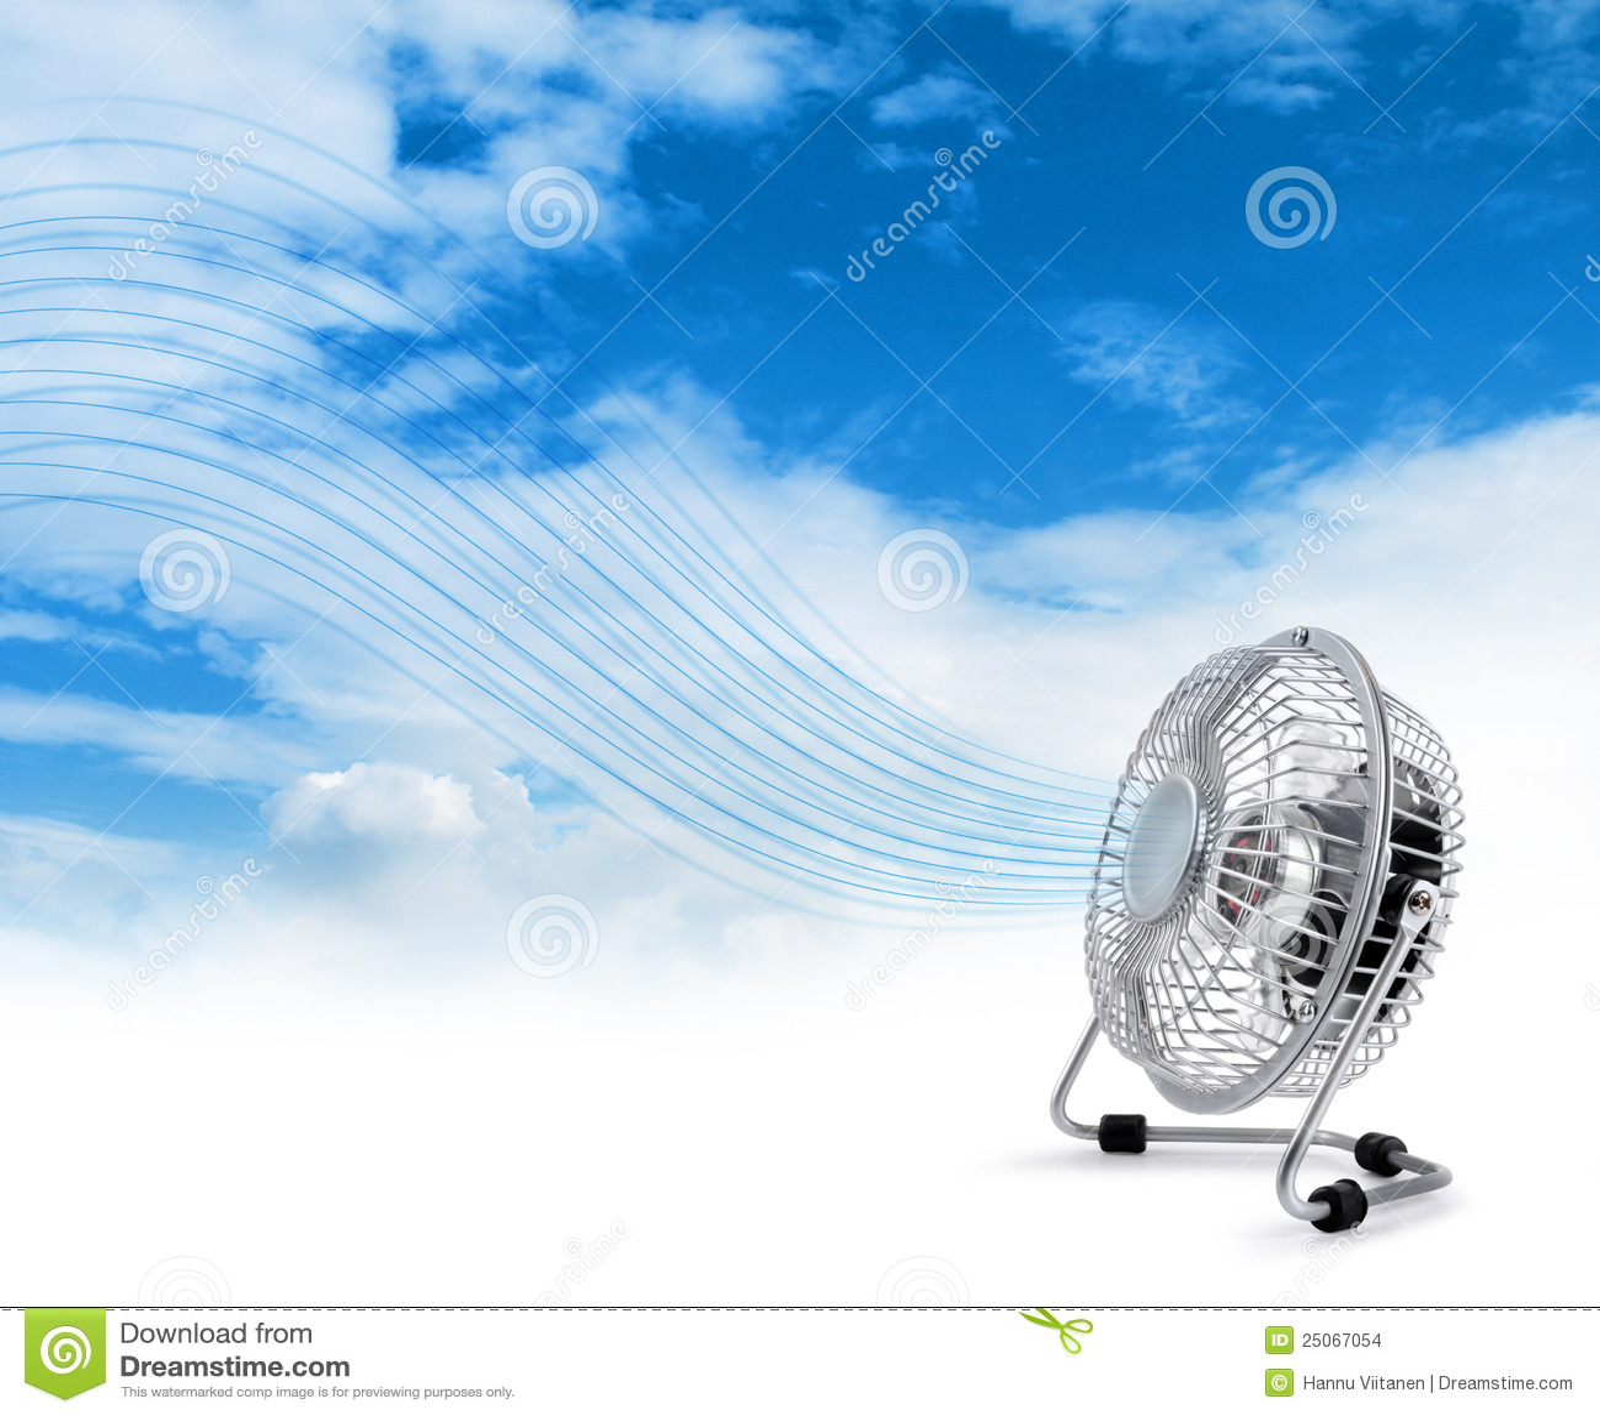 Cloud Blowing Air Electric fan blowing fresh air